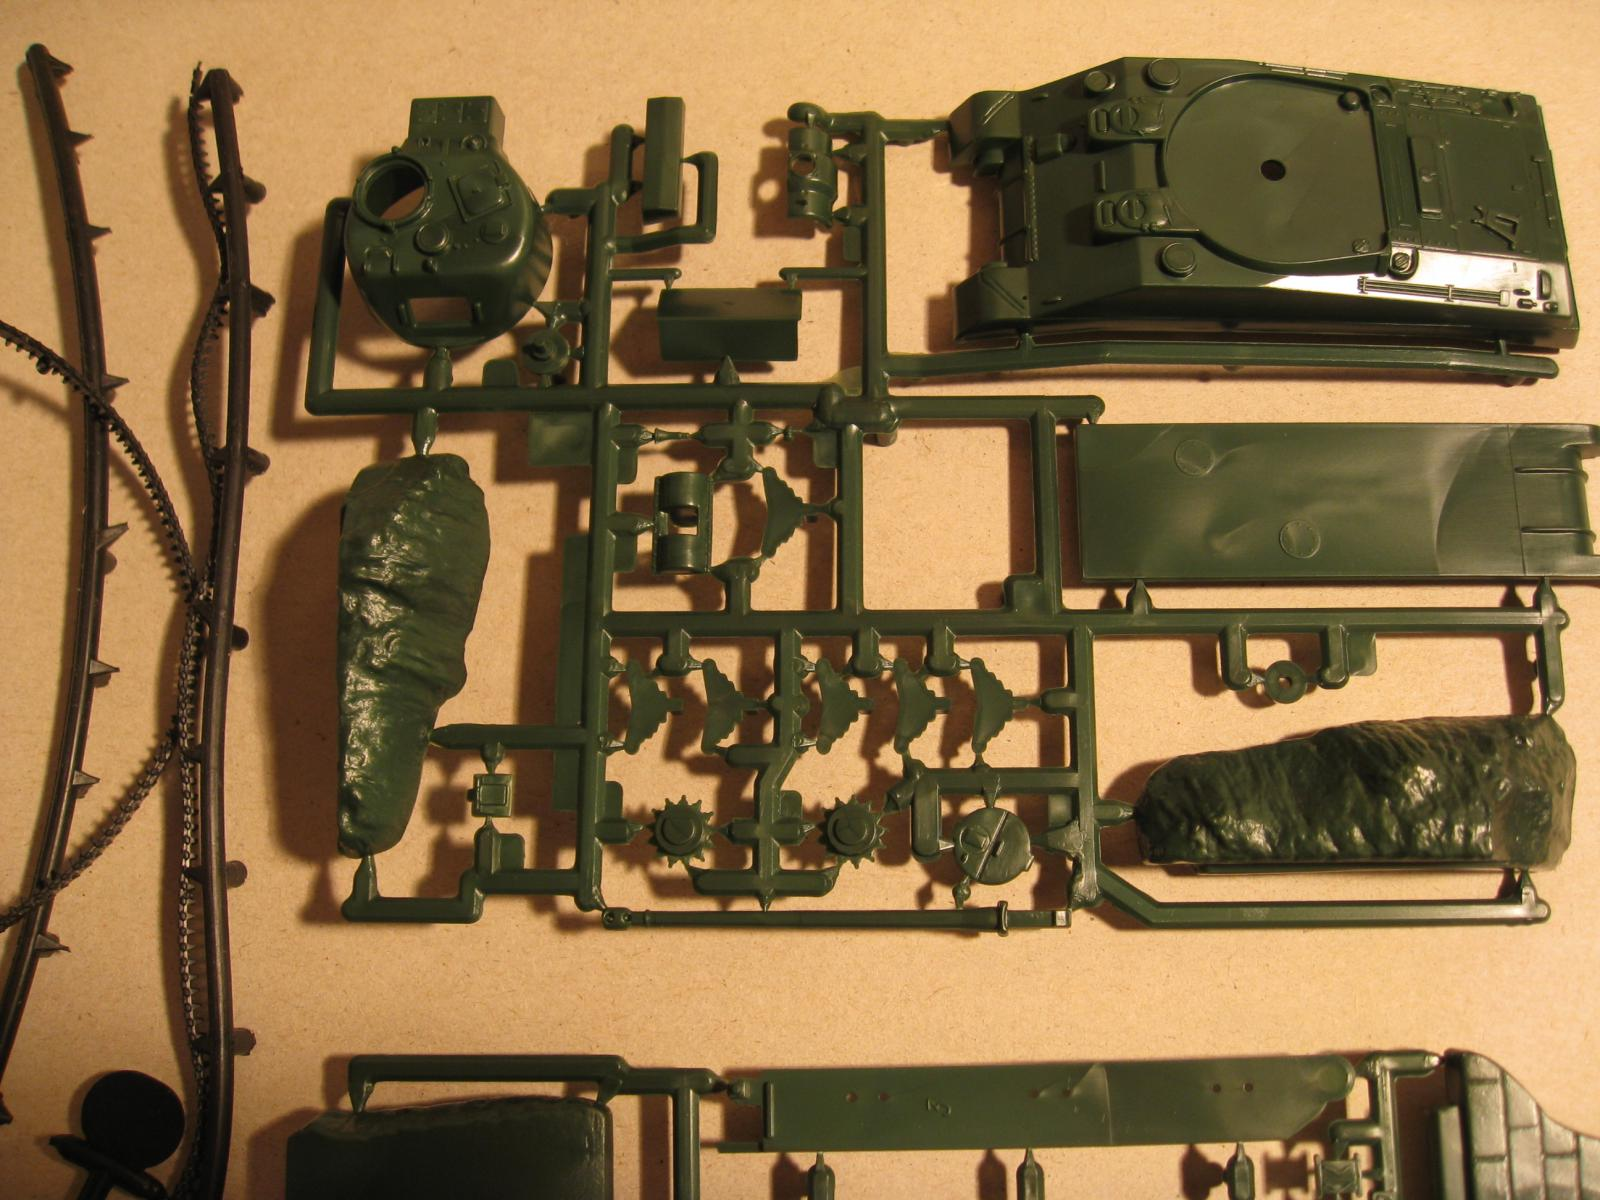 Sherman Firefly 1/76 Matchbox Kn1y-bx-d1f2